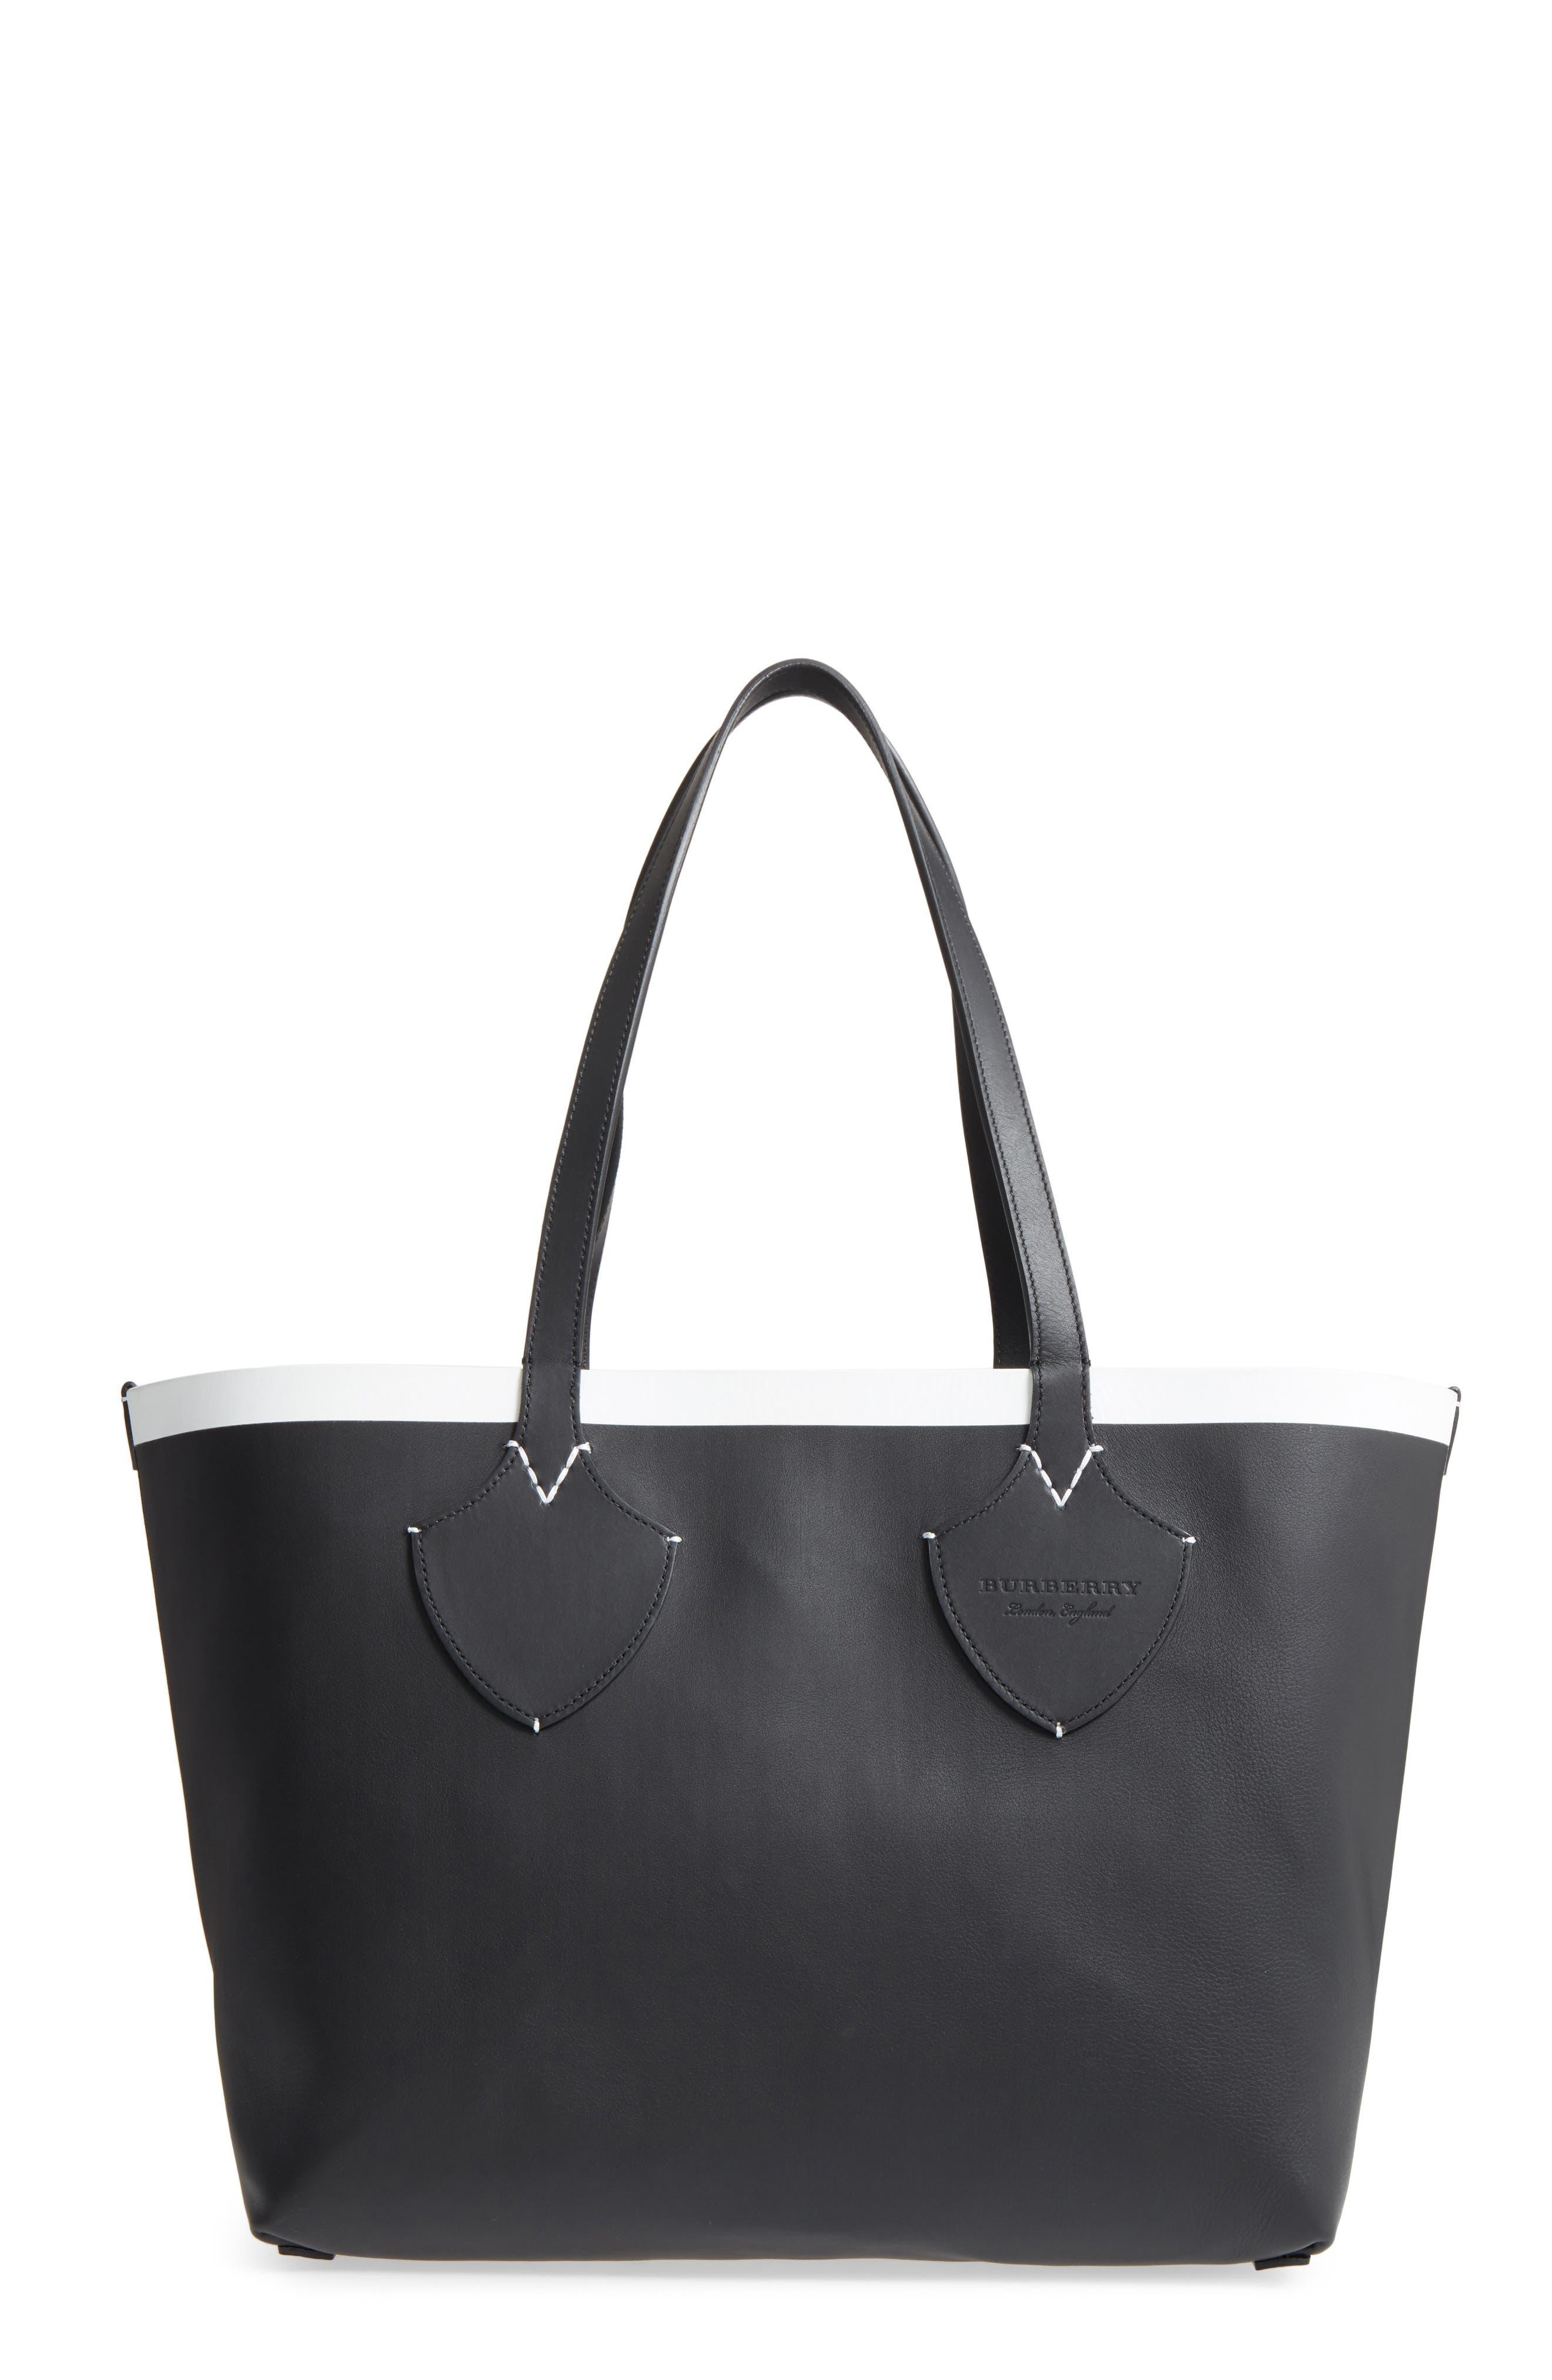 Medium Reversible Leather & Check Canvas Tote,                         Main,                         color, BLACK/ WHITE